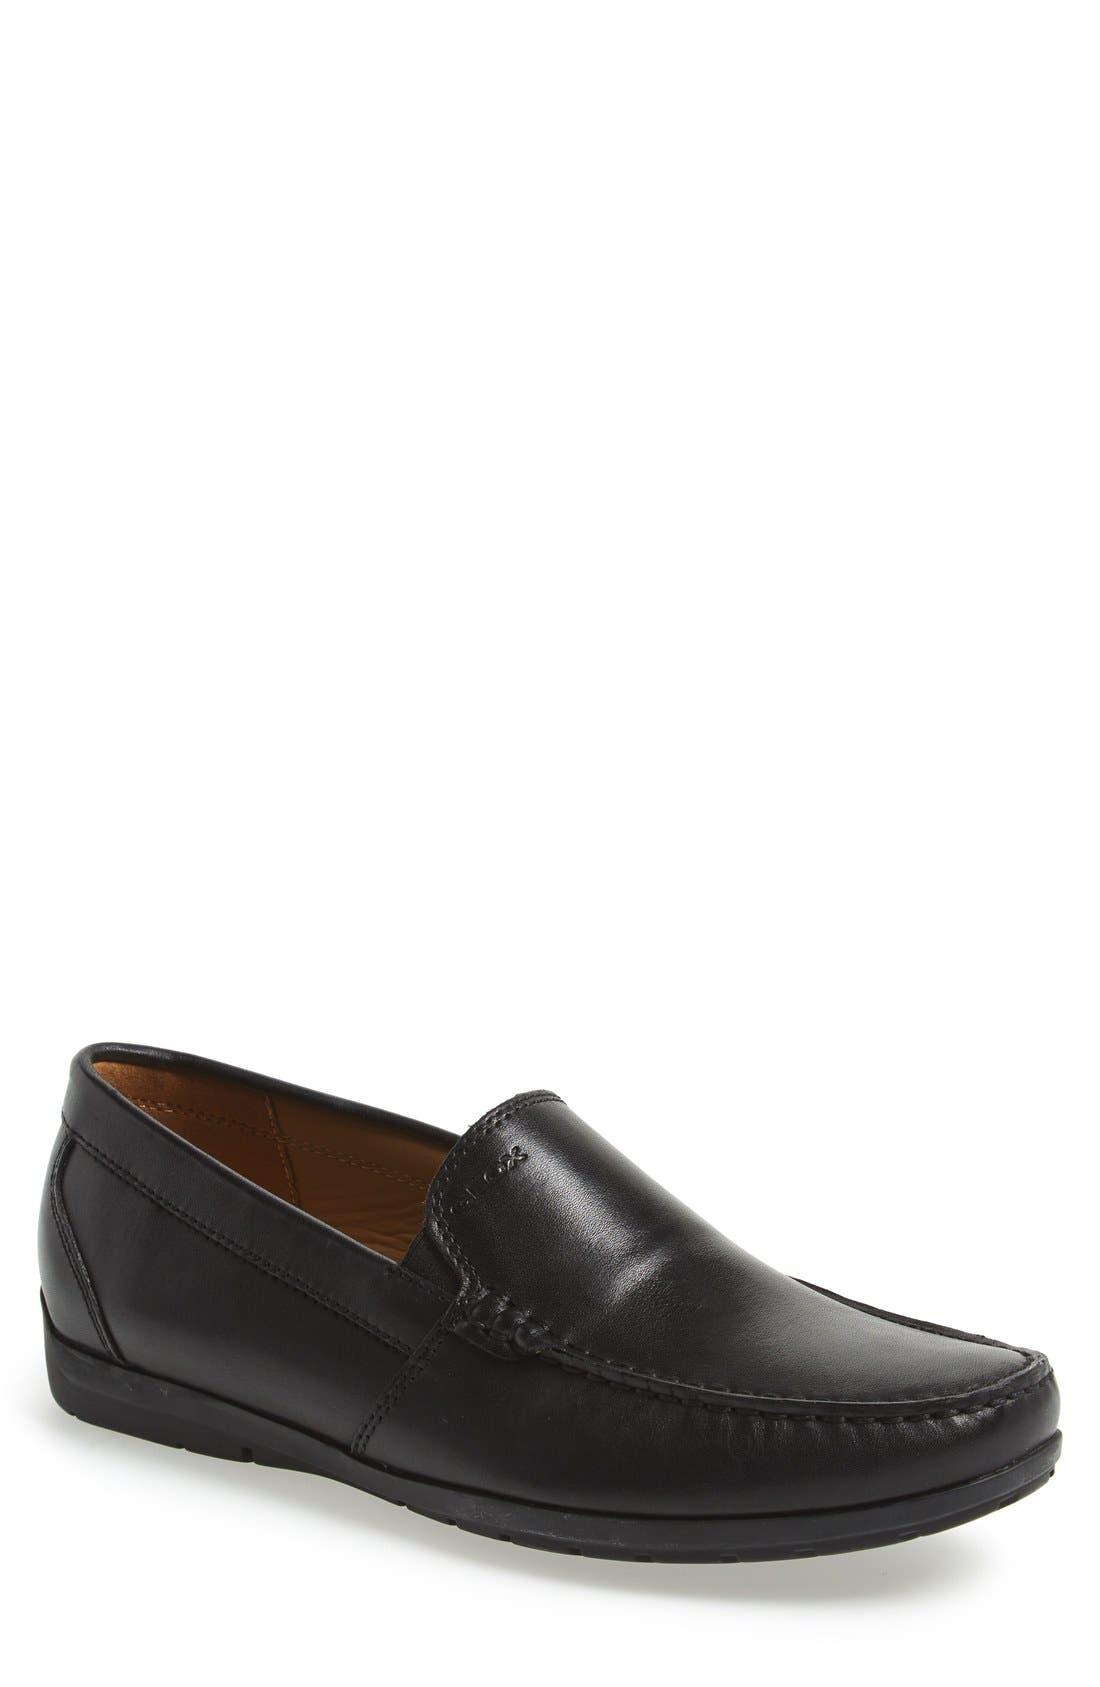 Main Image - Geox 'Simon W2' Venetian Loafer (Men)